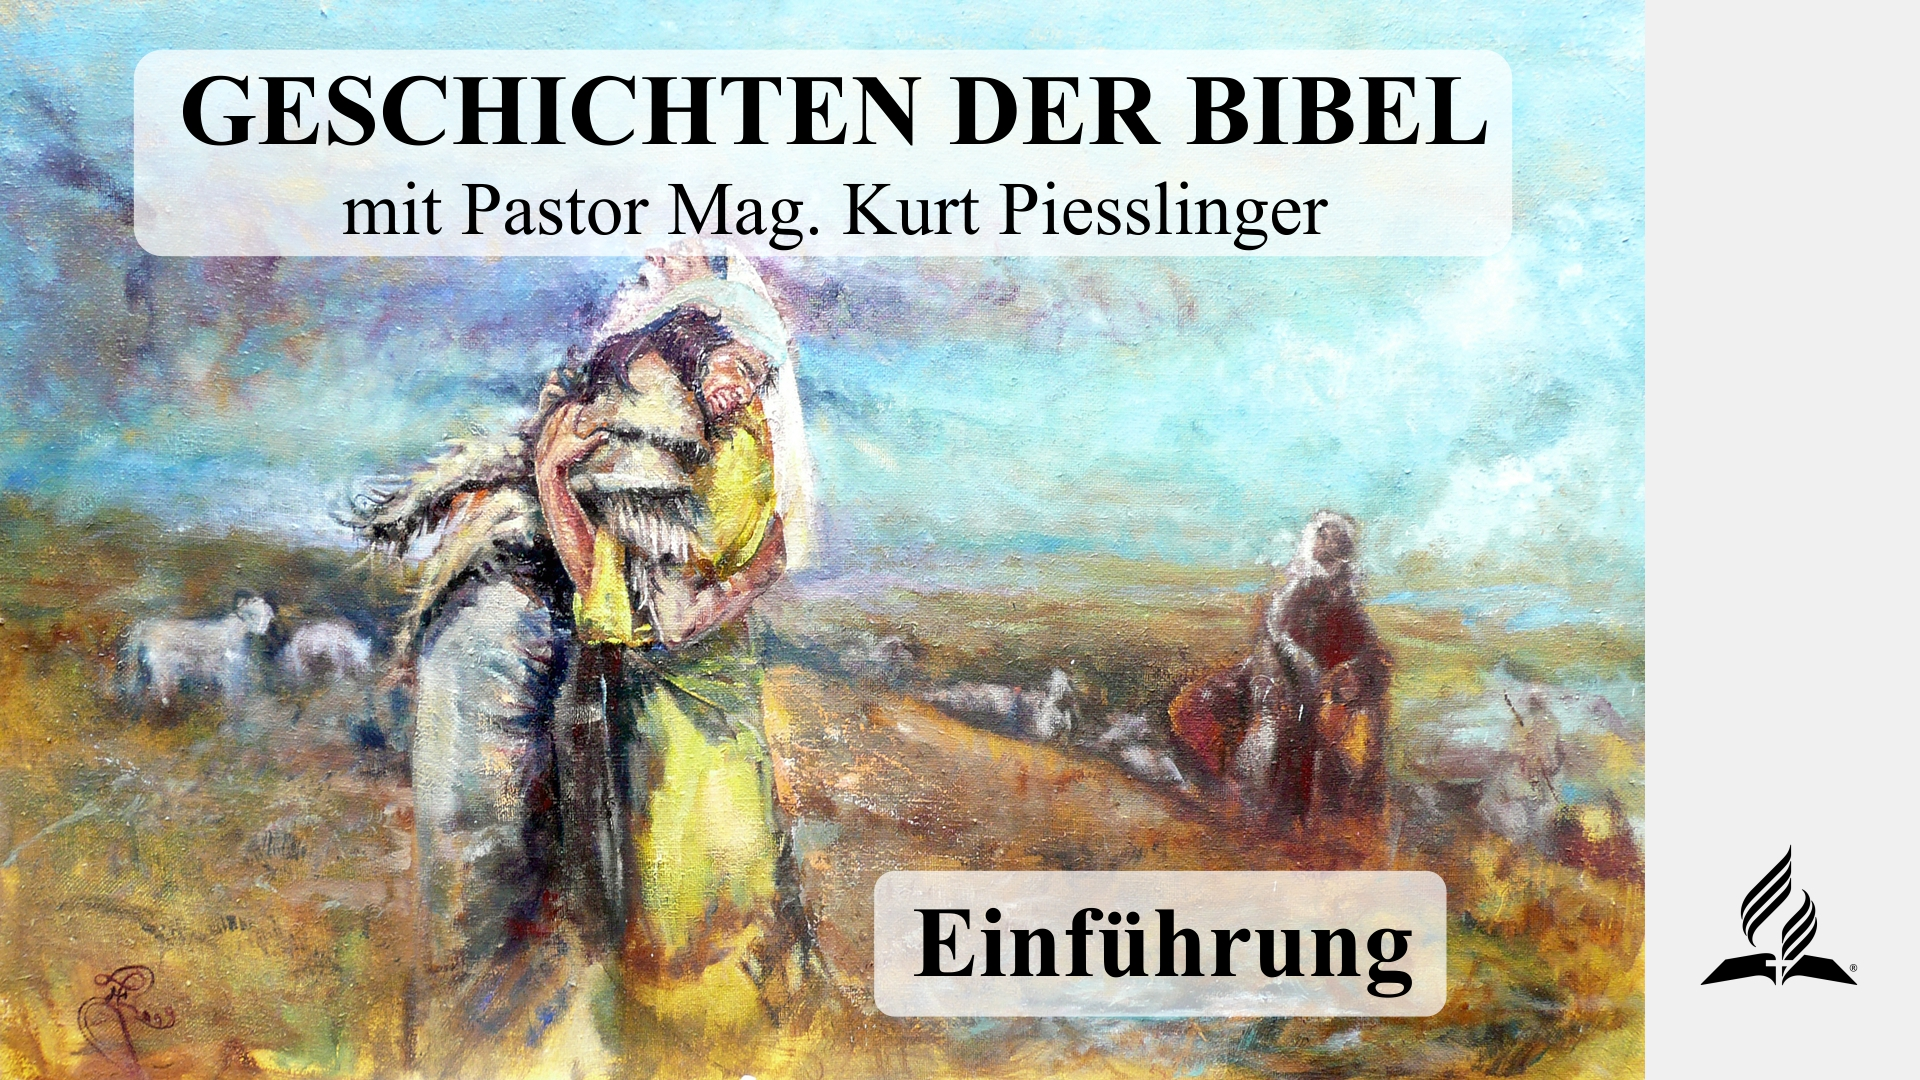 Einführung – GESCHICHTEN DER BIBEL | Pastor Mag. Kurt Piesslinger